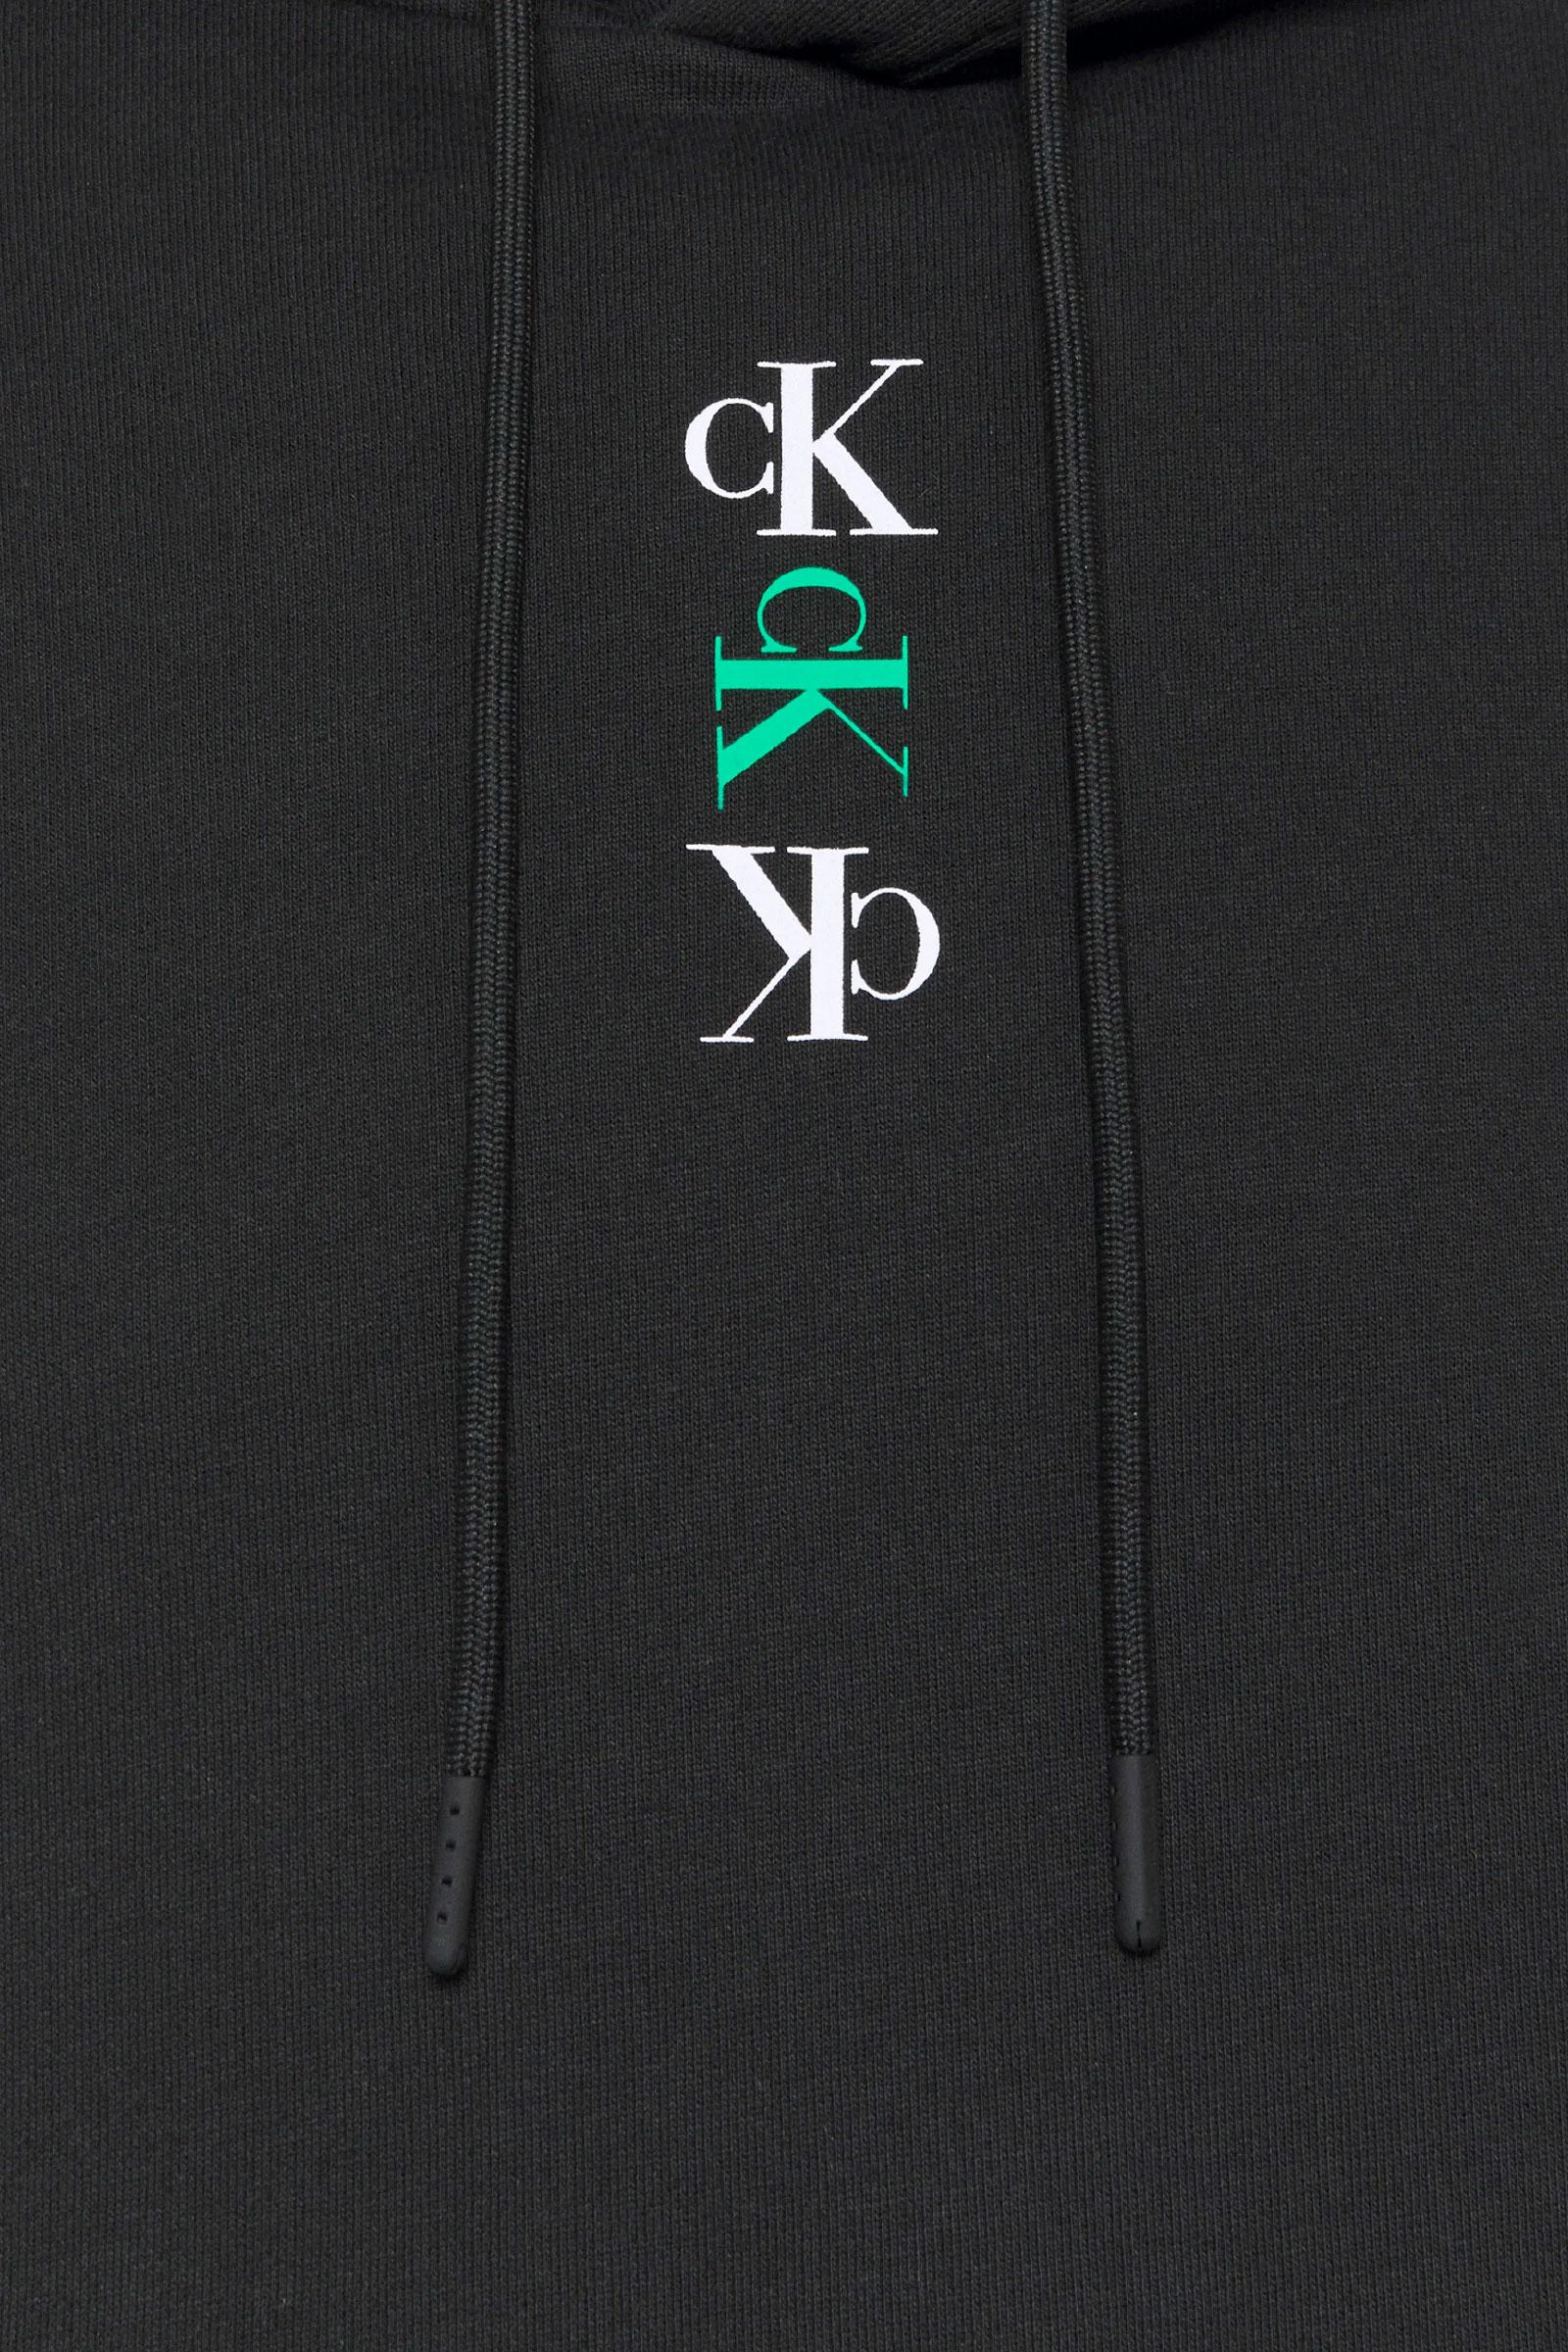 CALVIN KLEIN JEANS Men's Sweatshirt CALVIN KLEIN JEANS | Sweatshirt | J30J318302BEH